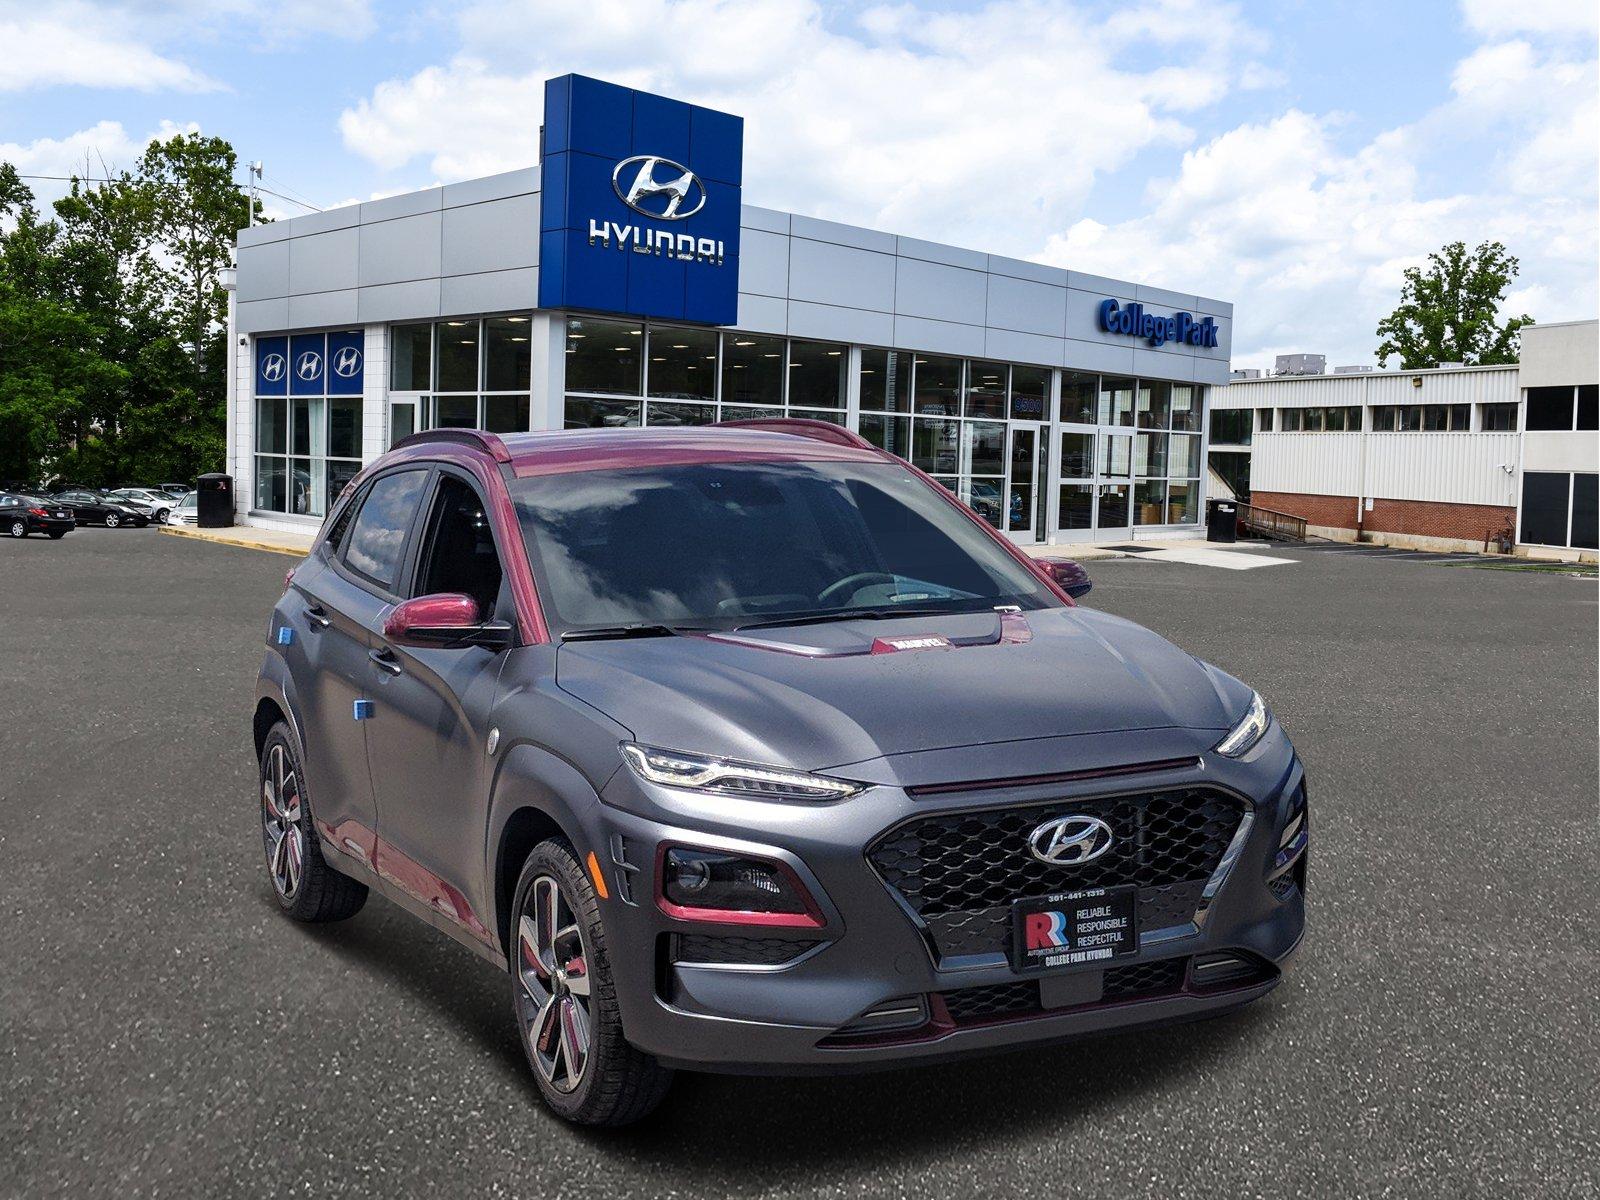 2019 Hyundai Kona SUV